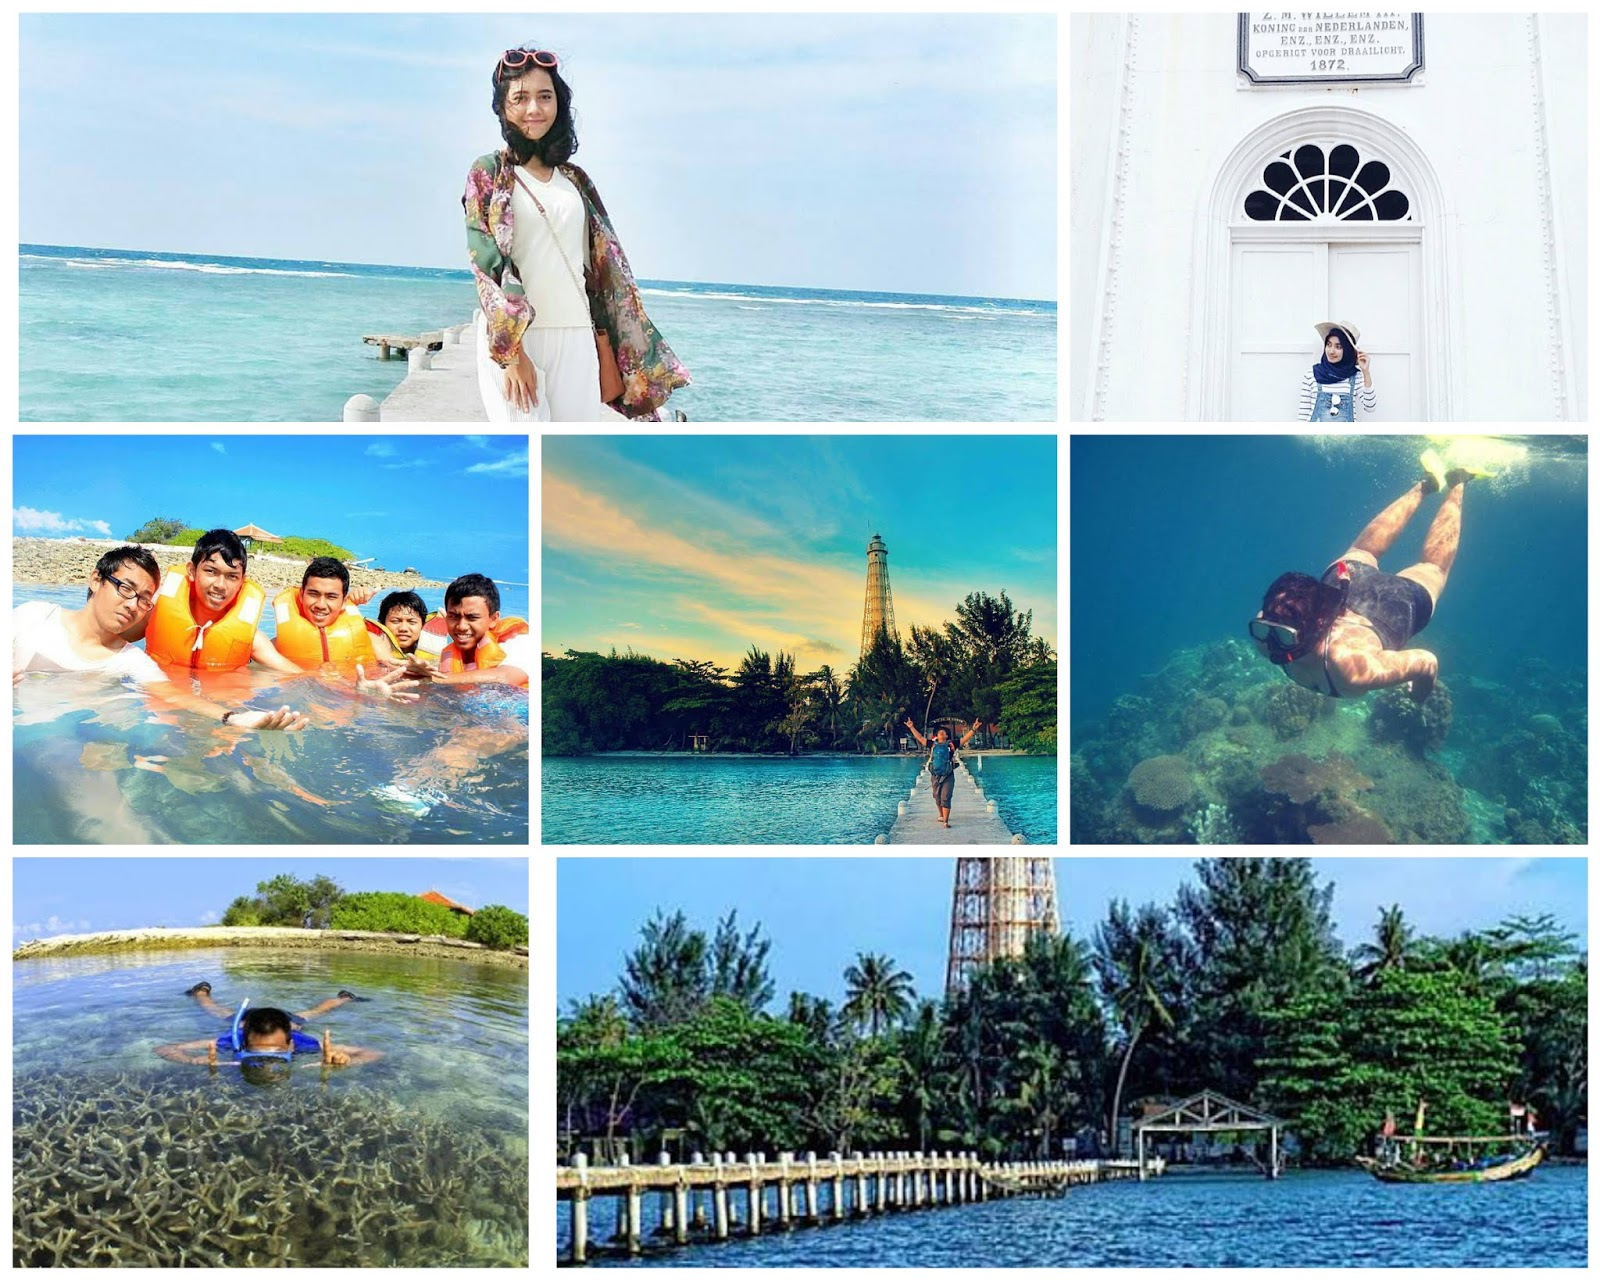 Keindahan Pulau biawak Indramayu